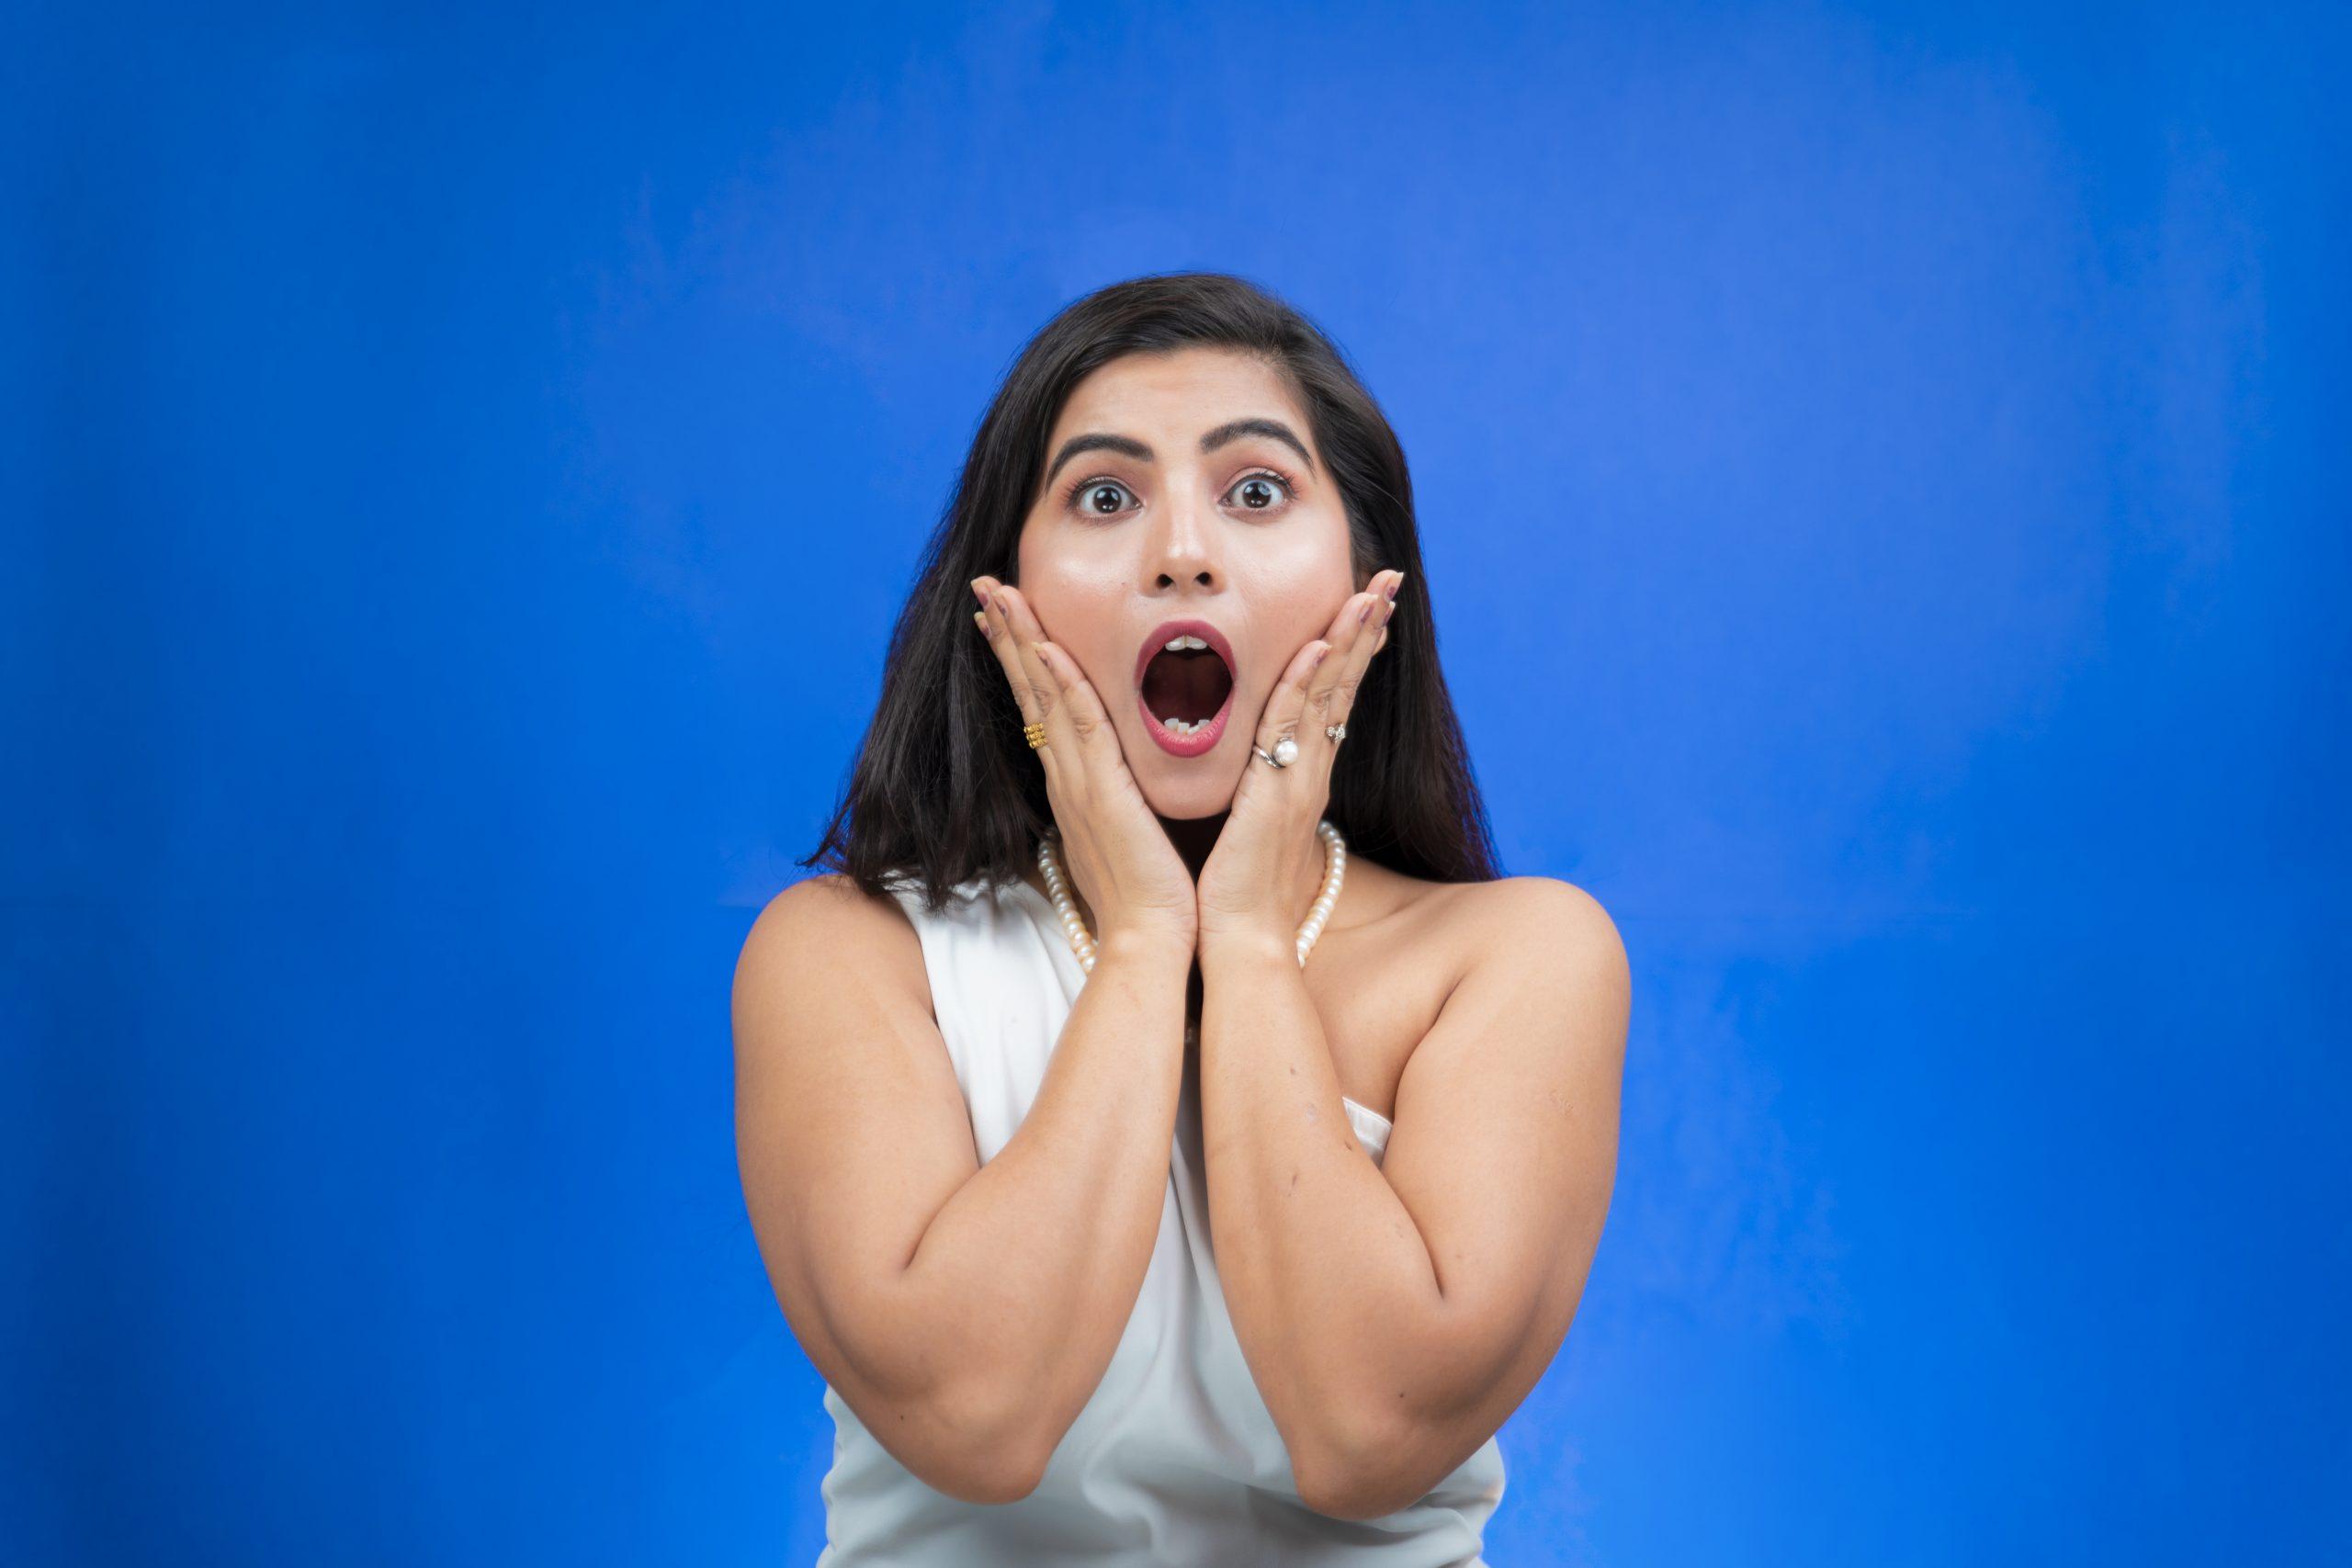 Shocked Indian girl